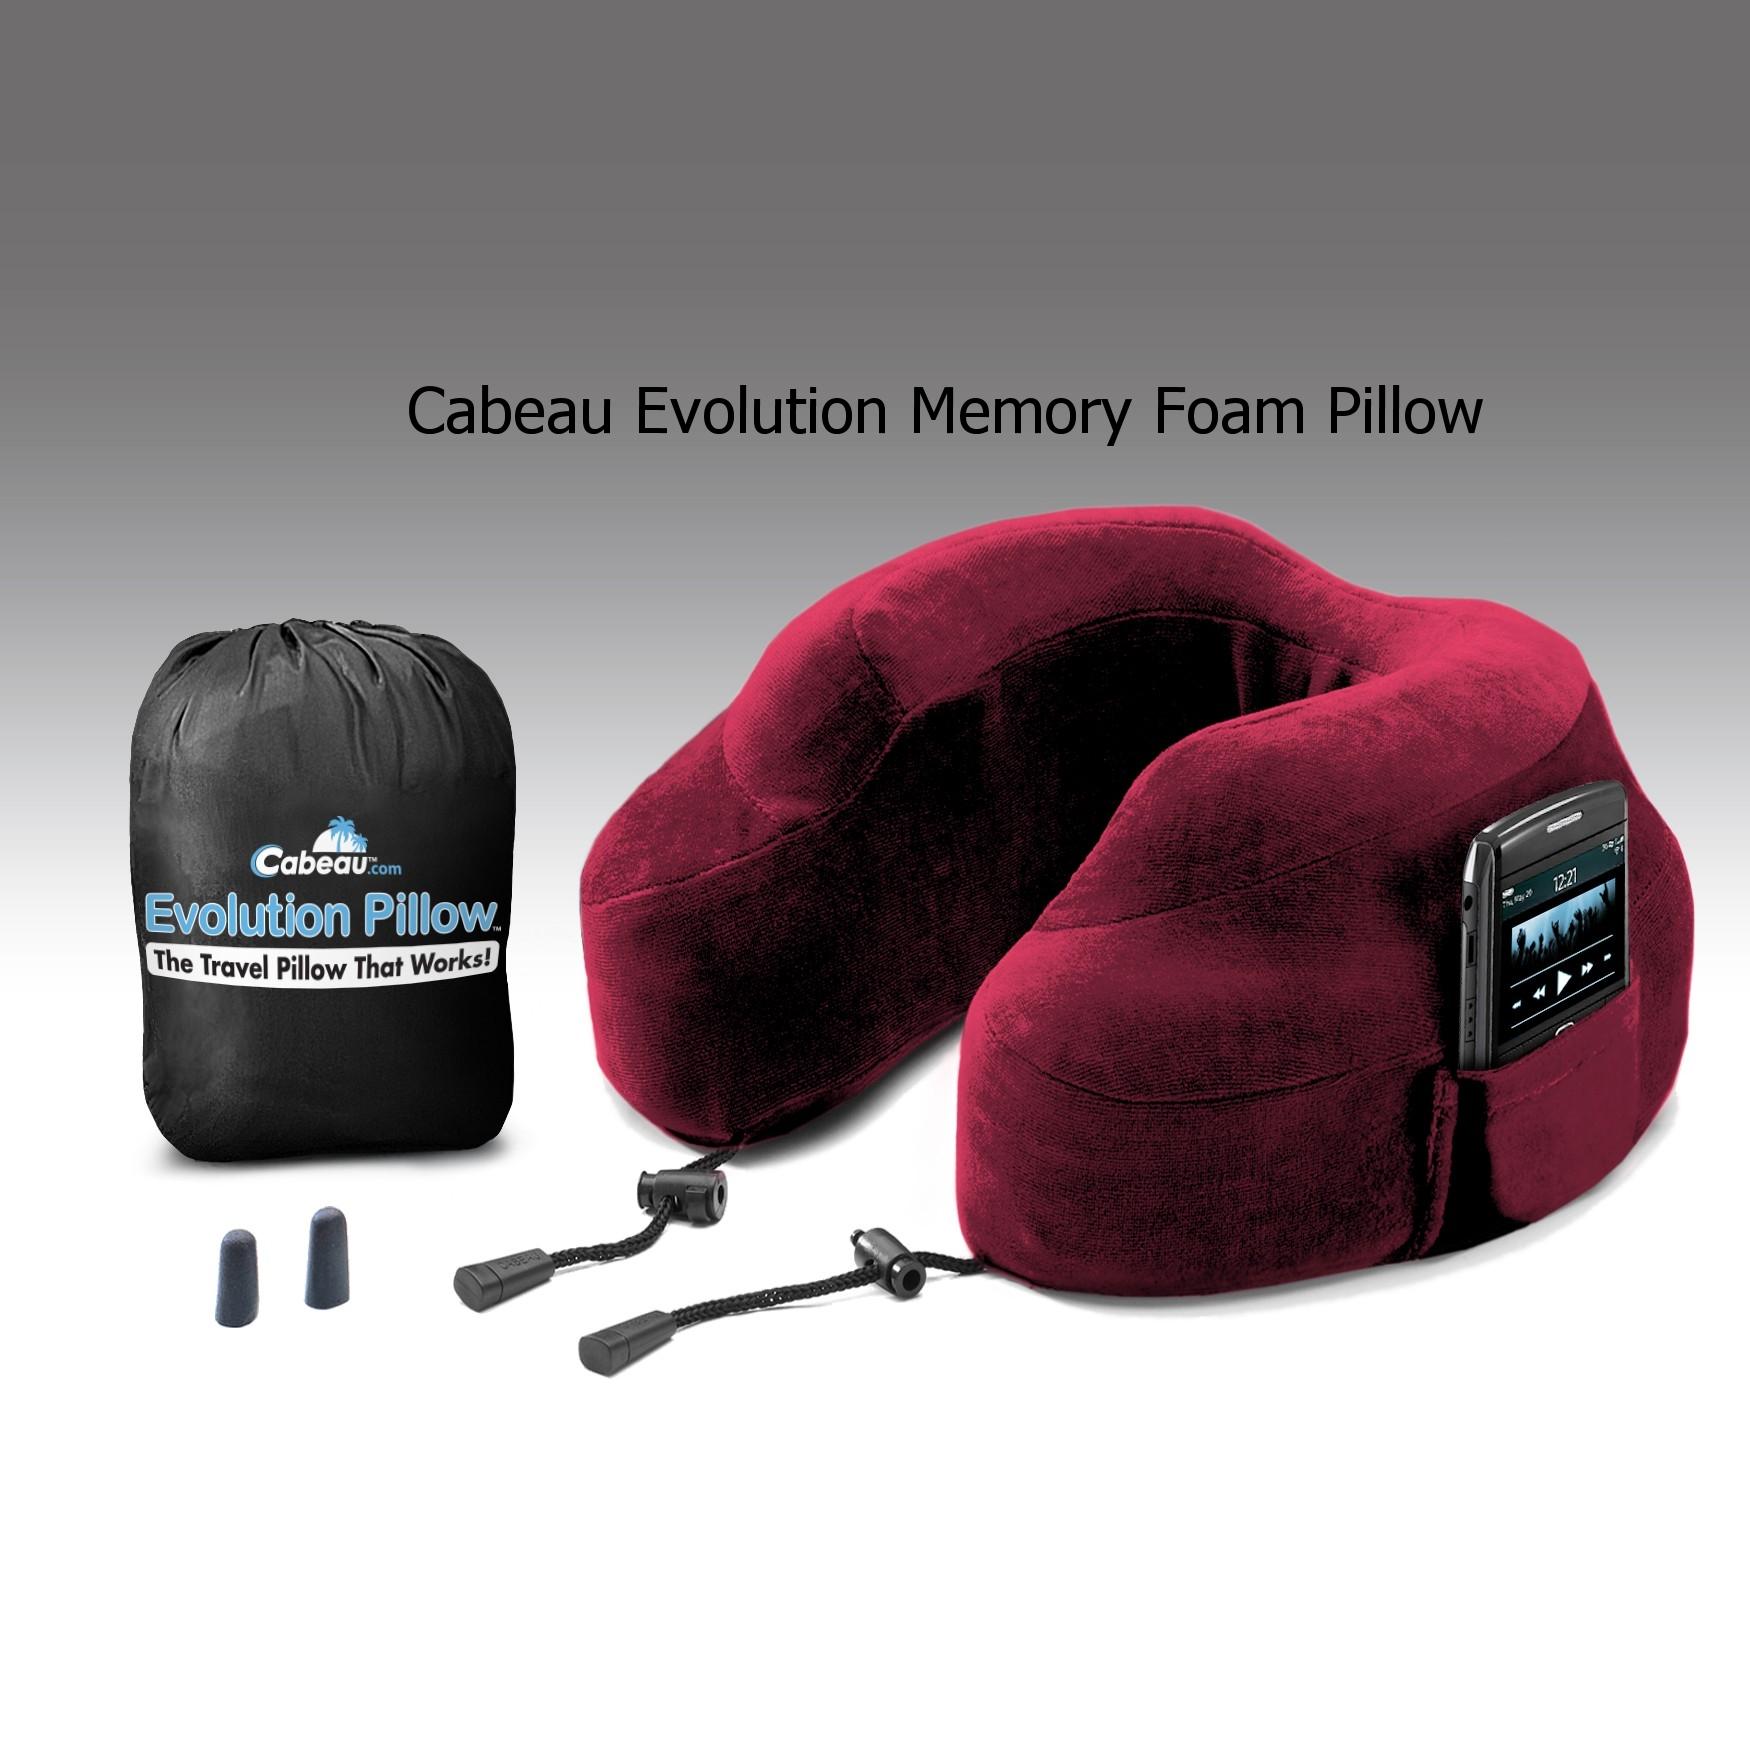 cabeau-evolution-pillow-crimson-display_3.jpg